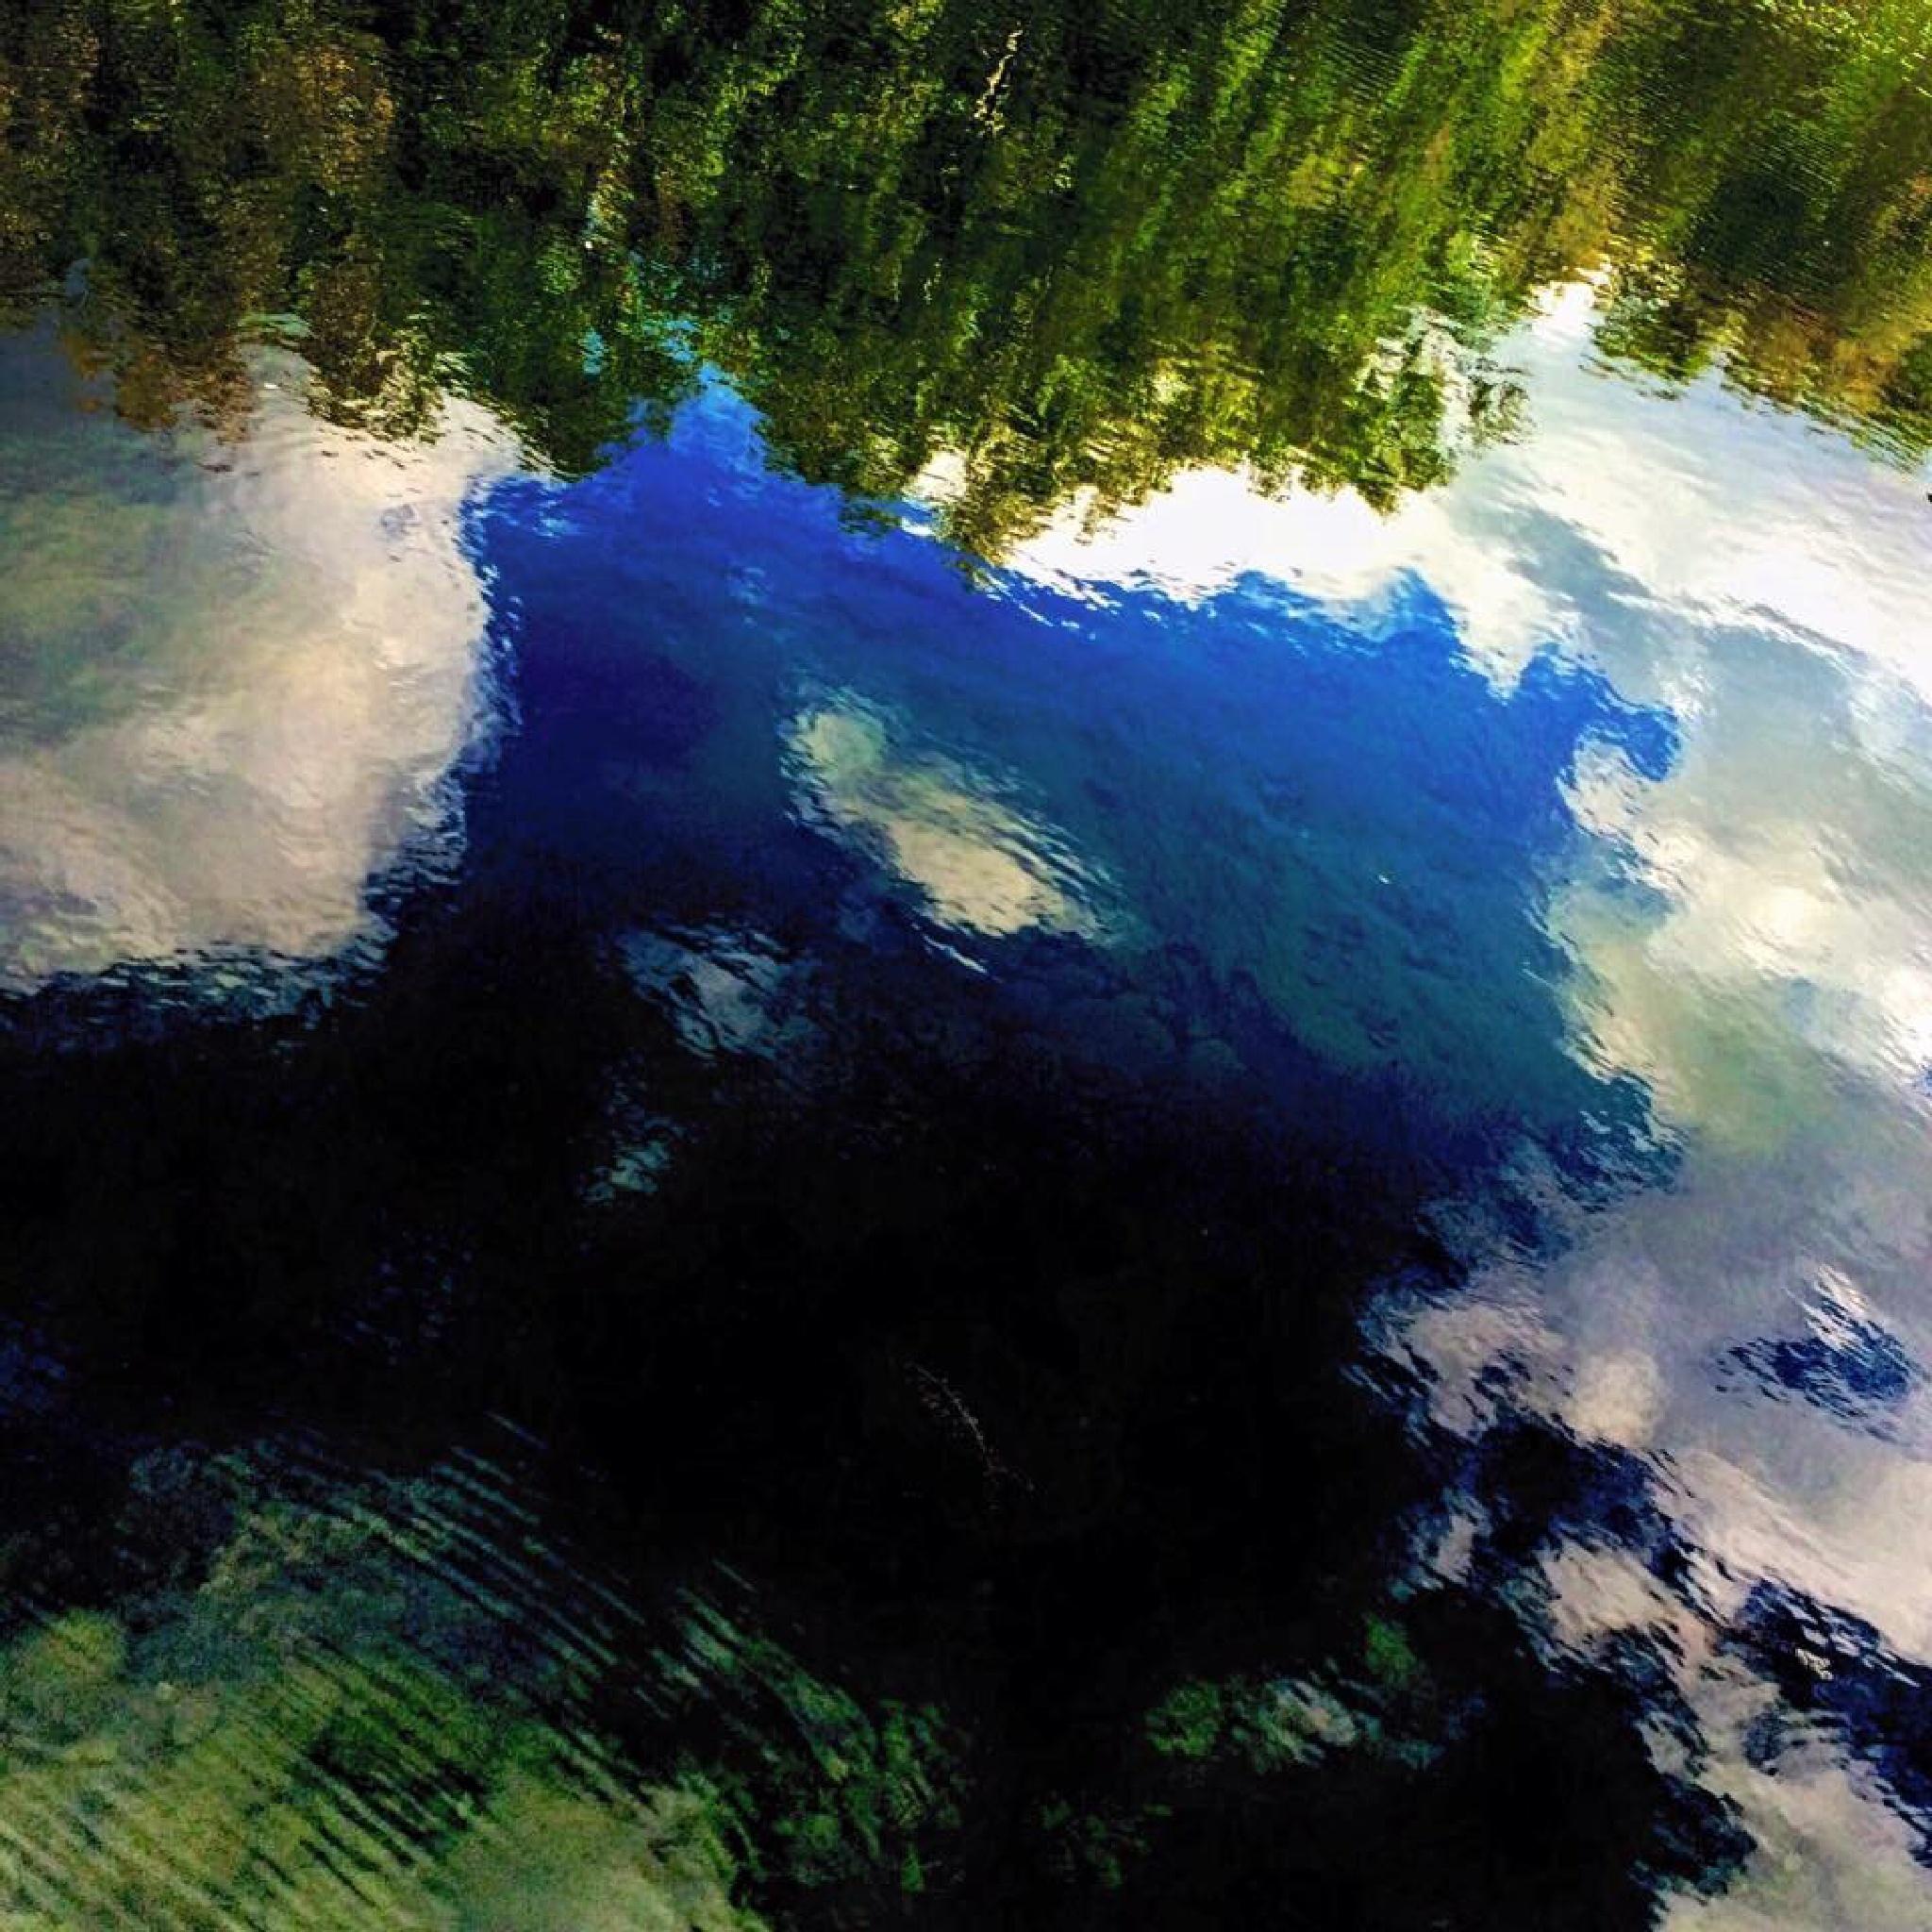 Untitled by Beata Kozak